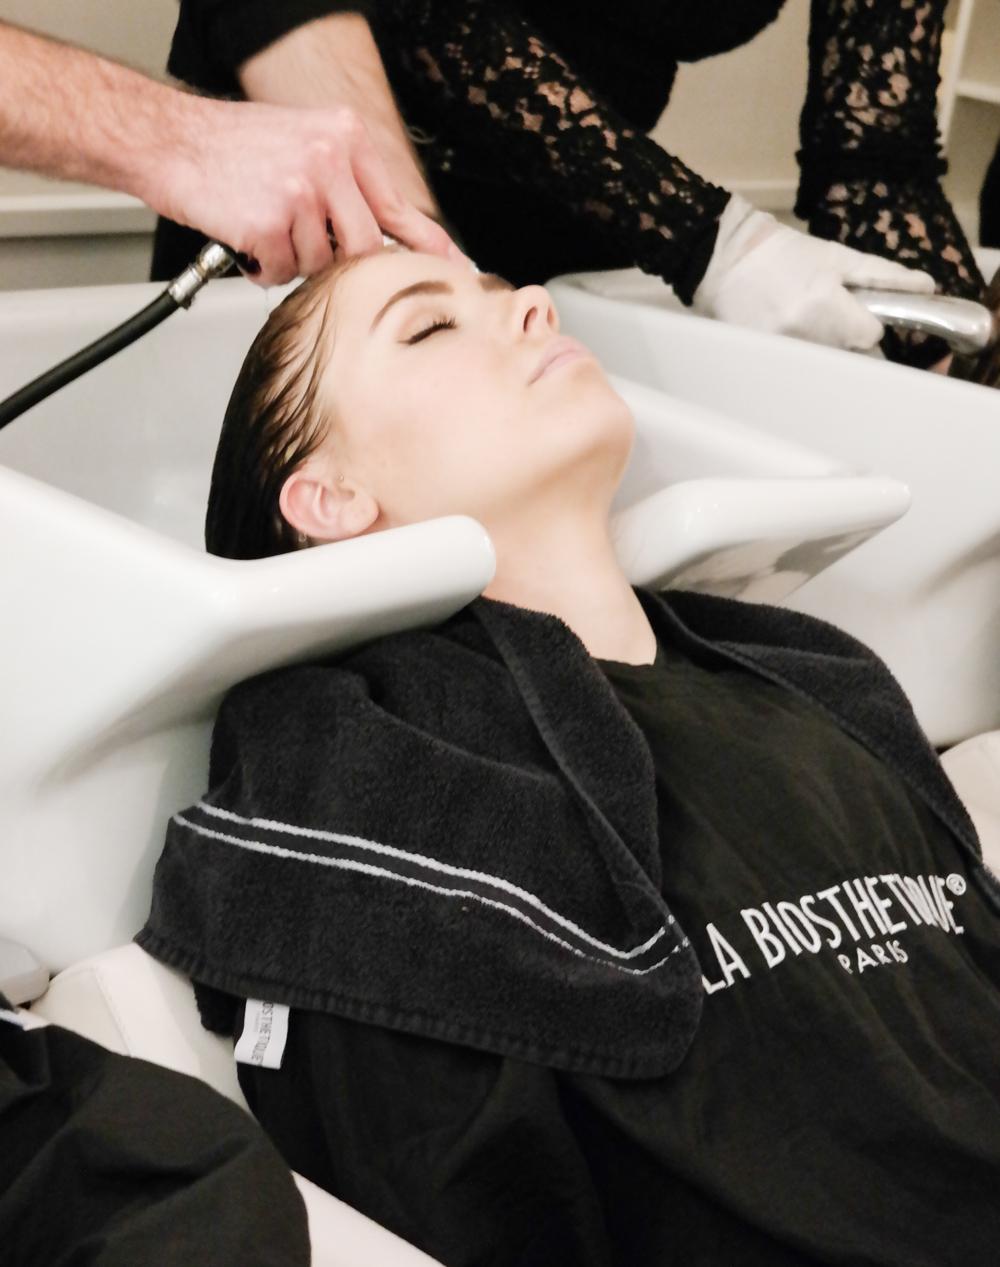 TheRubinRose- Friseursalon Cyrill Zen -Balayage-Modeblog München-Fashionblog München-Modeblogger-Fashionblogger-Deutschland-Friseur-Friseursalon-Friseur München-Frisör München-Friseursalon München-Friseursalon Deutschland-Hairstylist München-Hairstylist-München-Deutschland-Haare-Locken-Ombre-Balayage-blond-Frisur-Schnitt